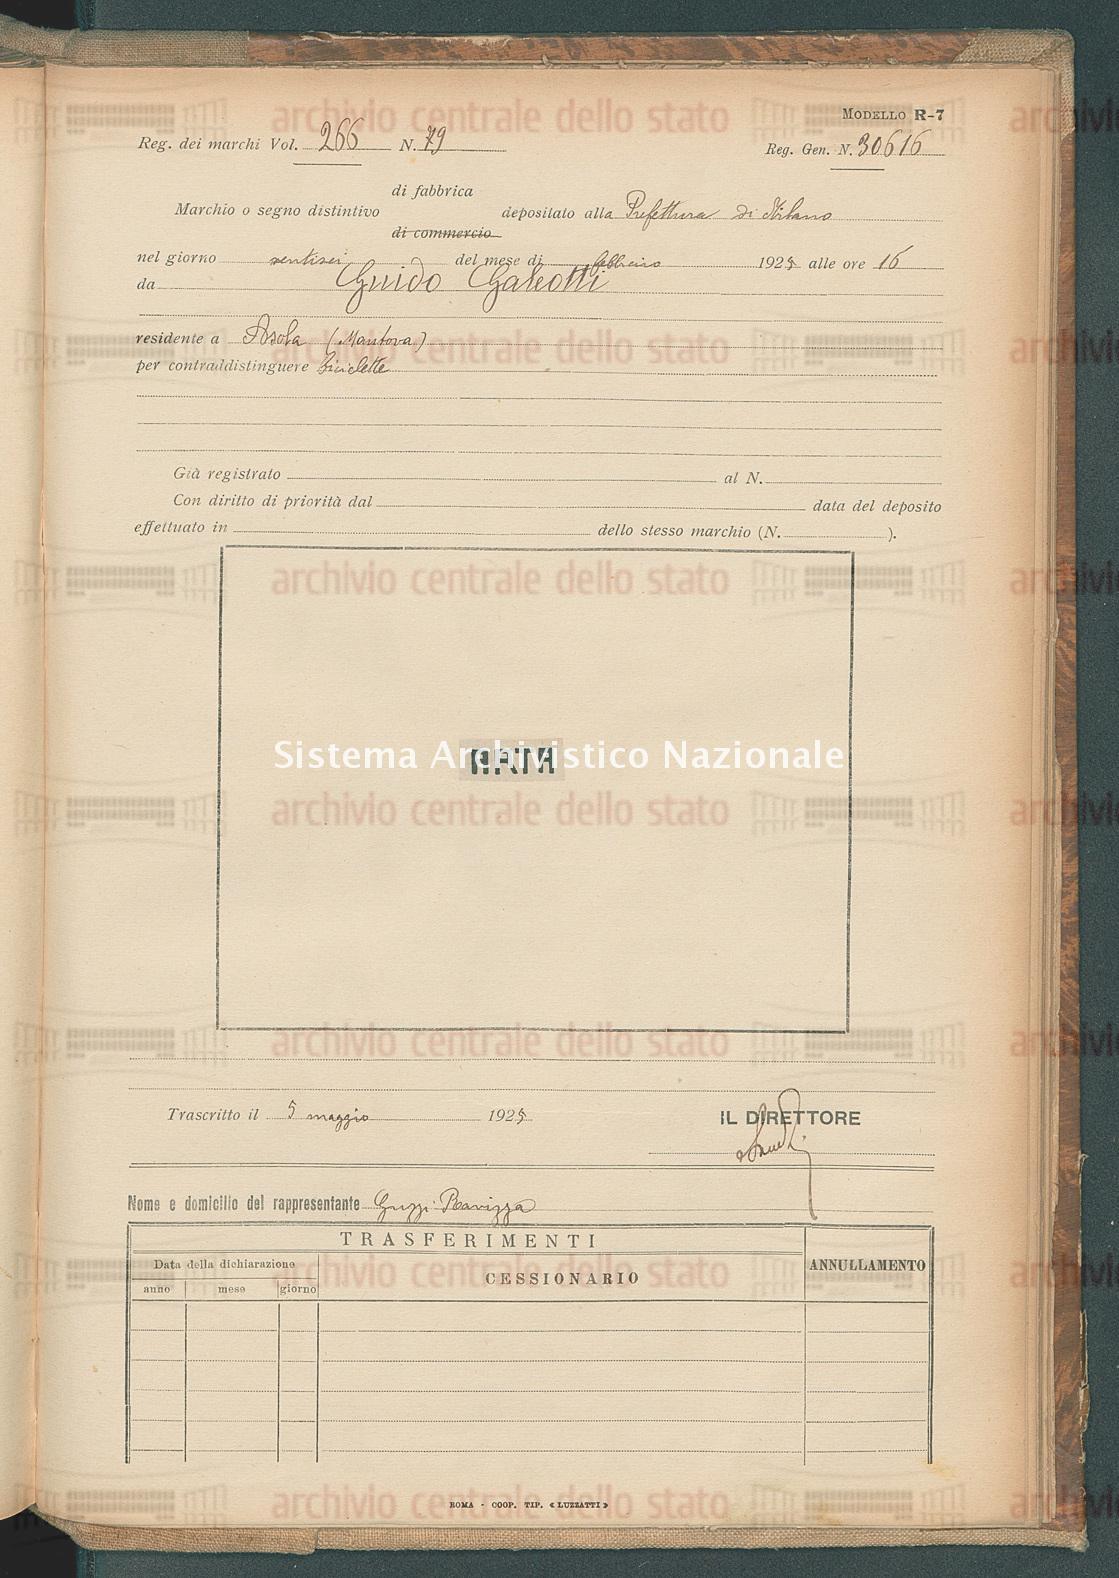 Guido Galeotti (05/05/1925)